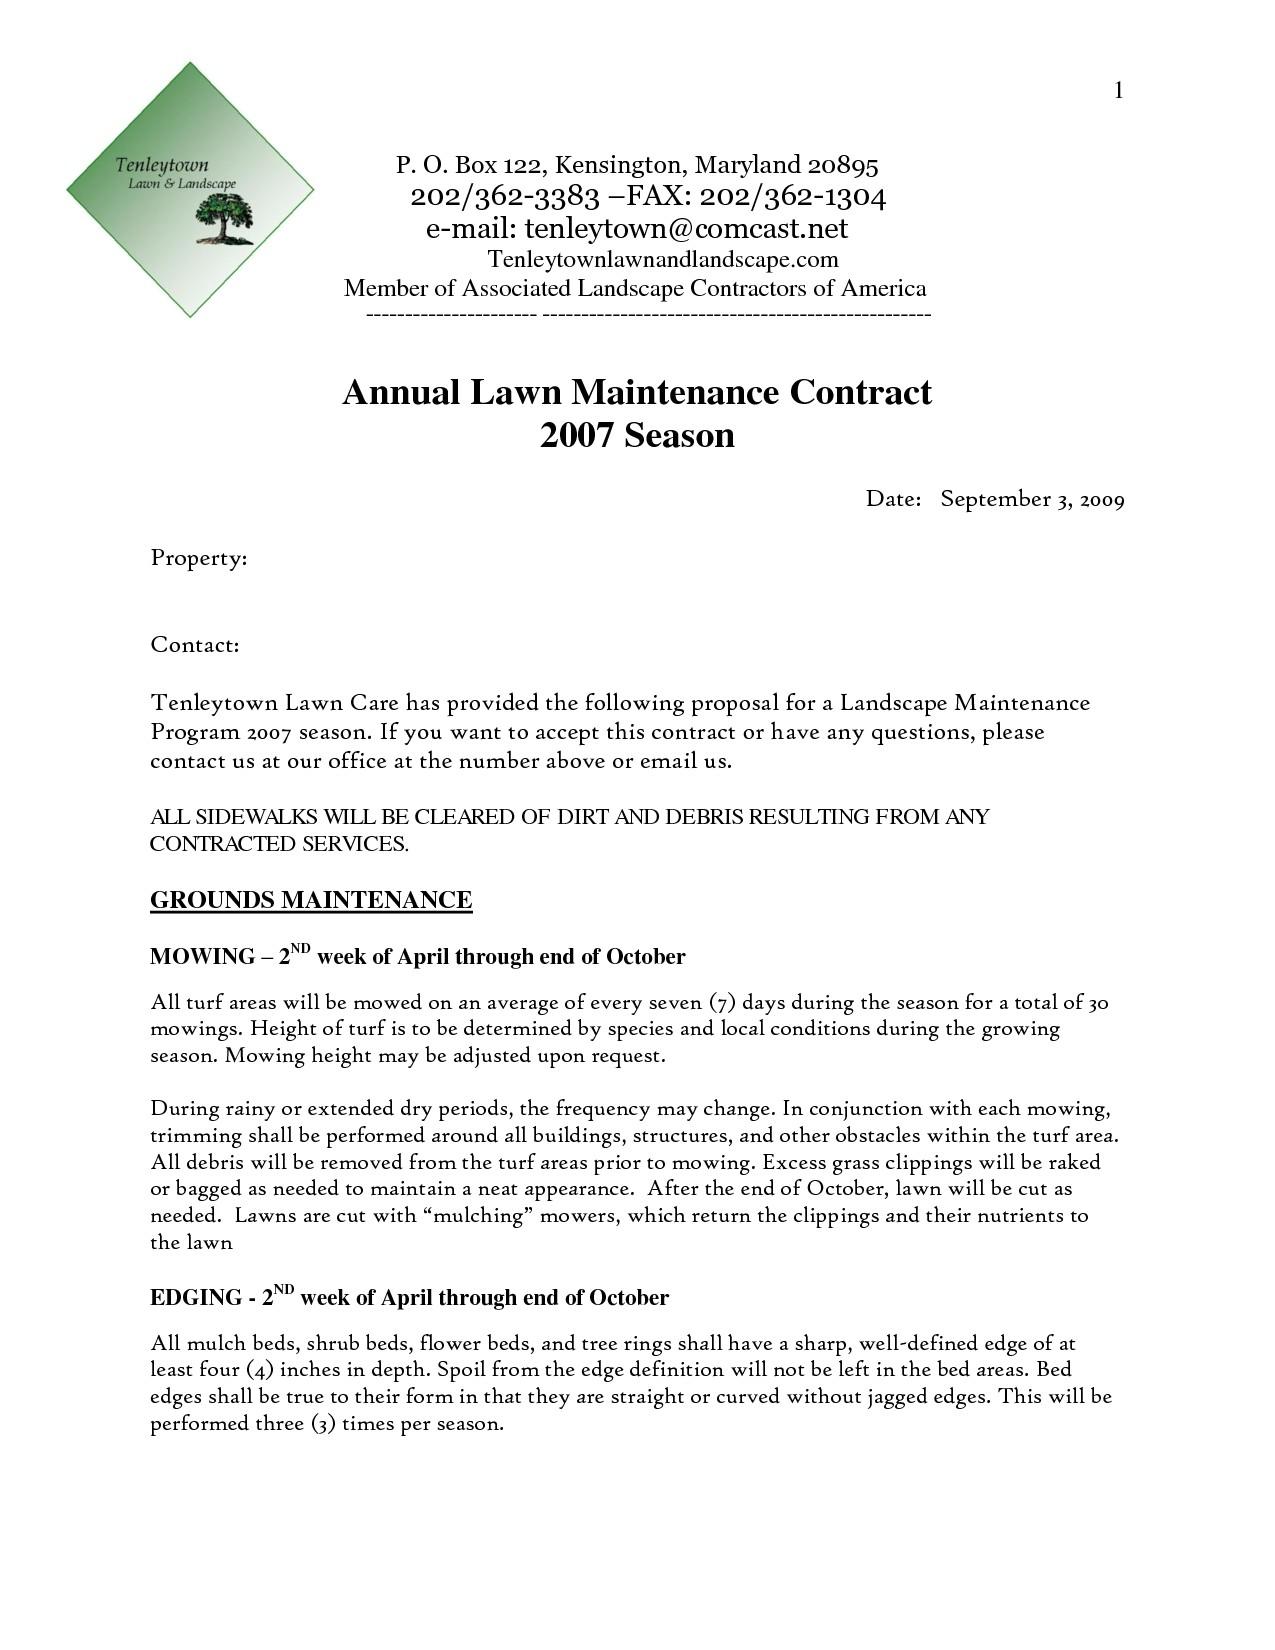 landscaping proposal sample